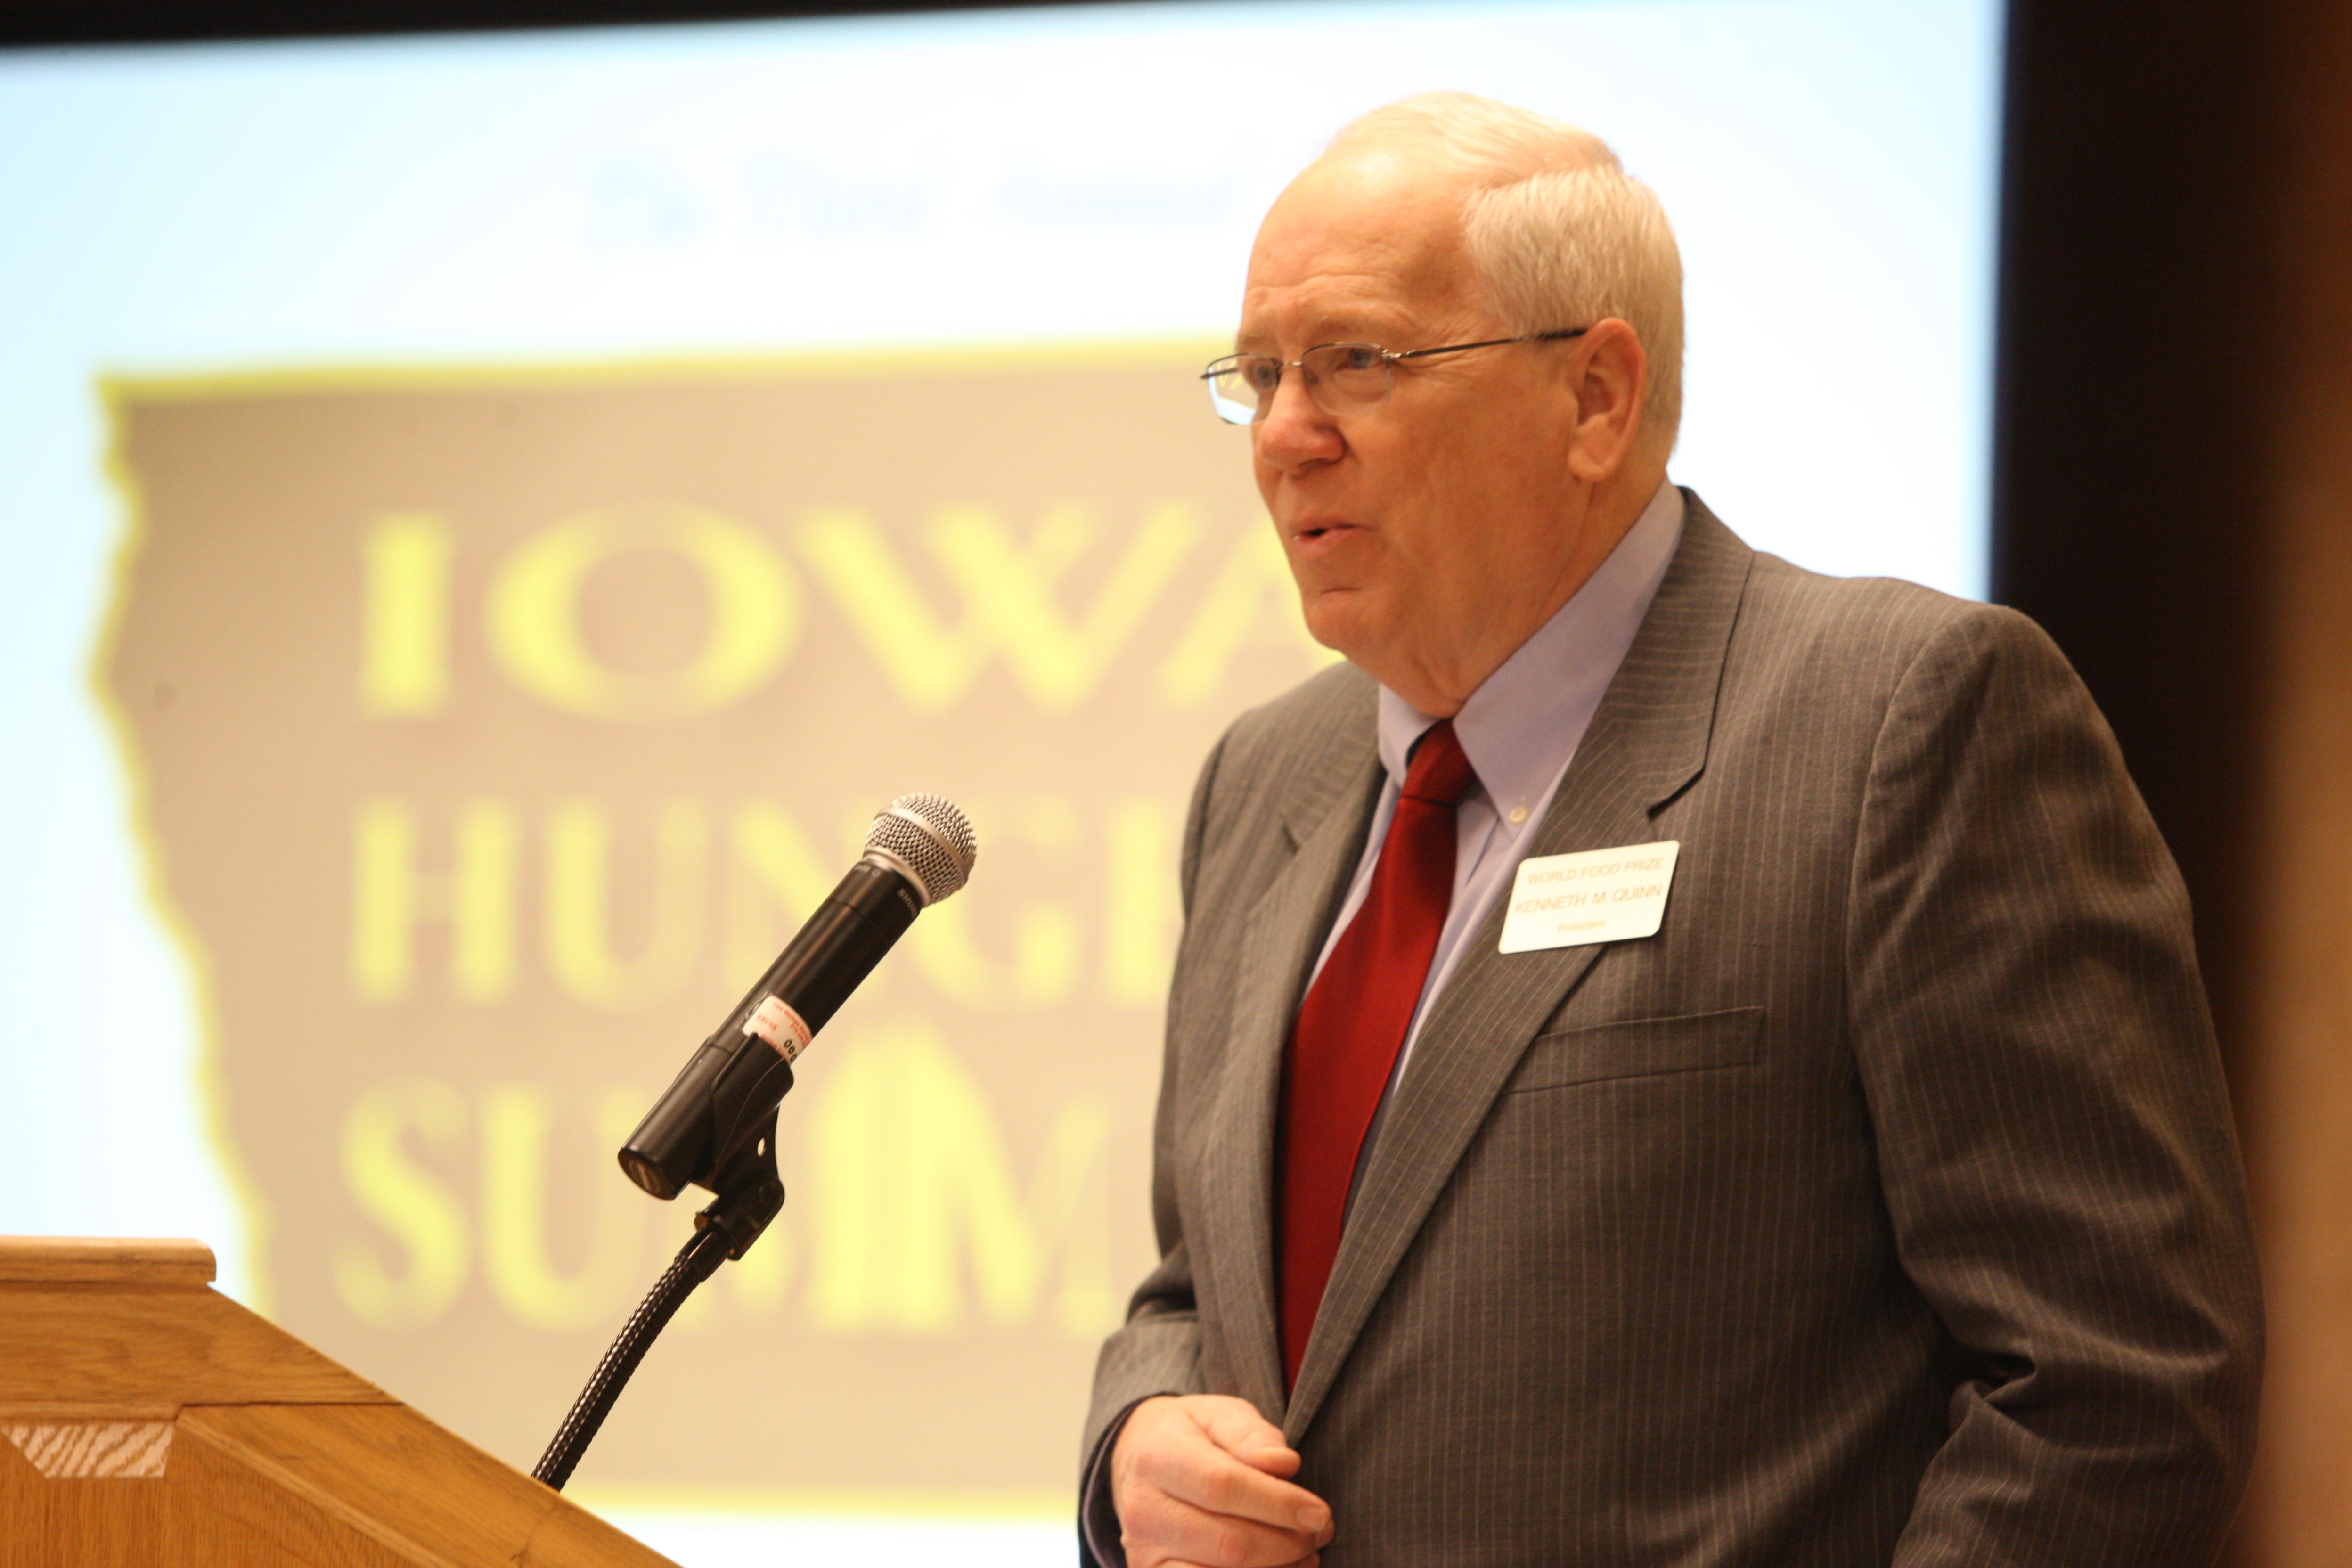 2009 Iowa Hunger Summit